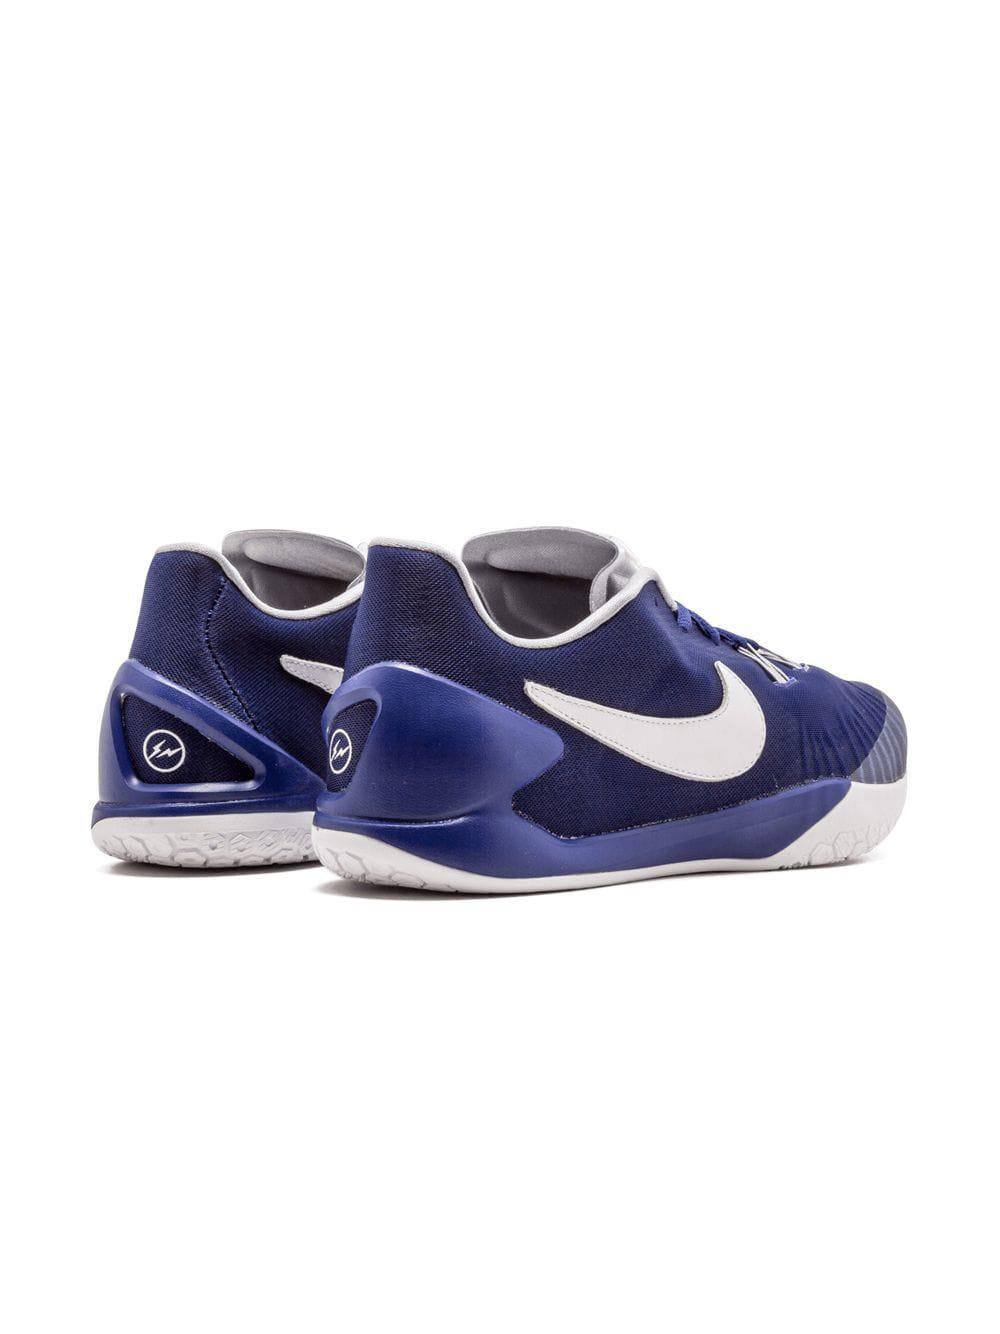 a6904b07675ef Nike Blue Hyperchase Sp/fragment Sneakers for men